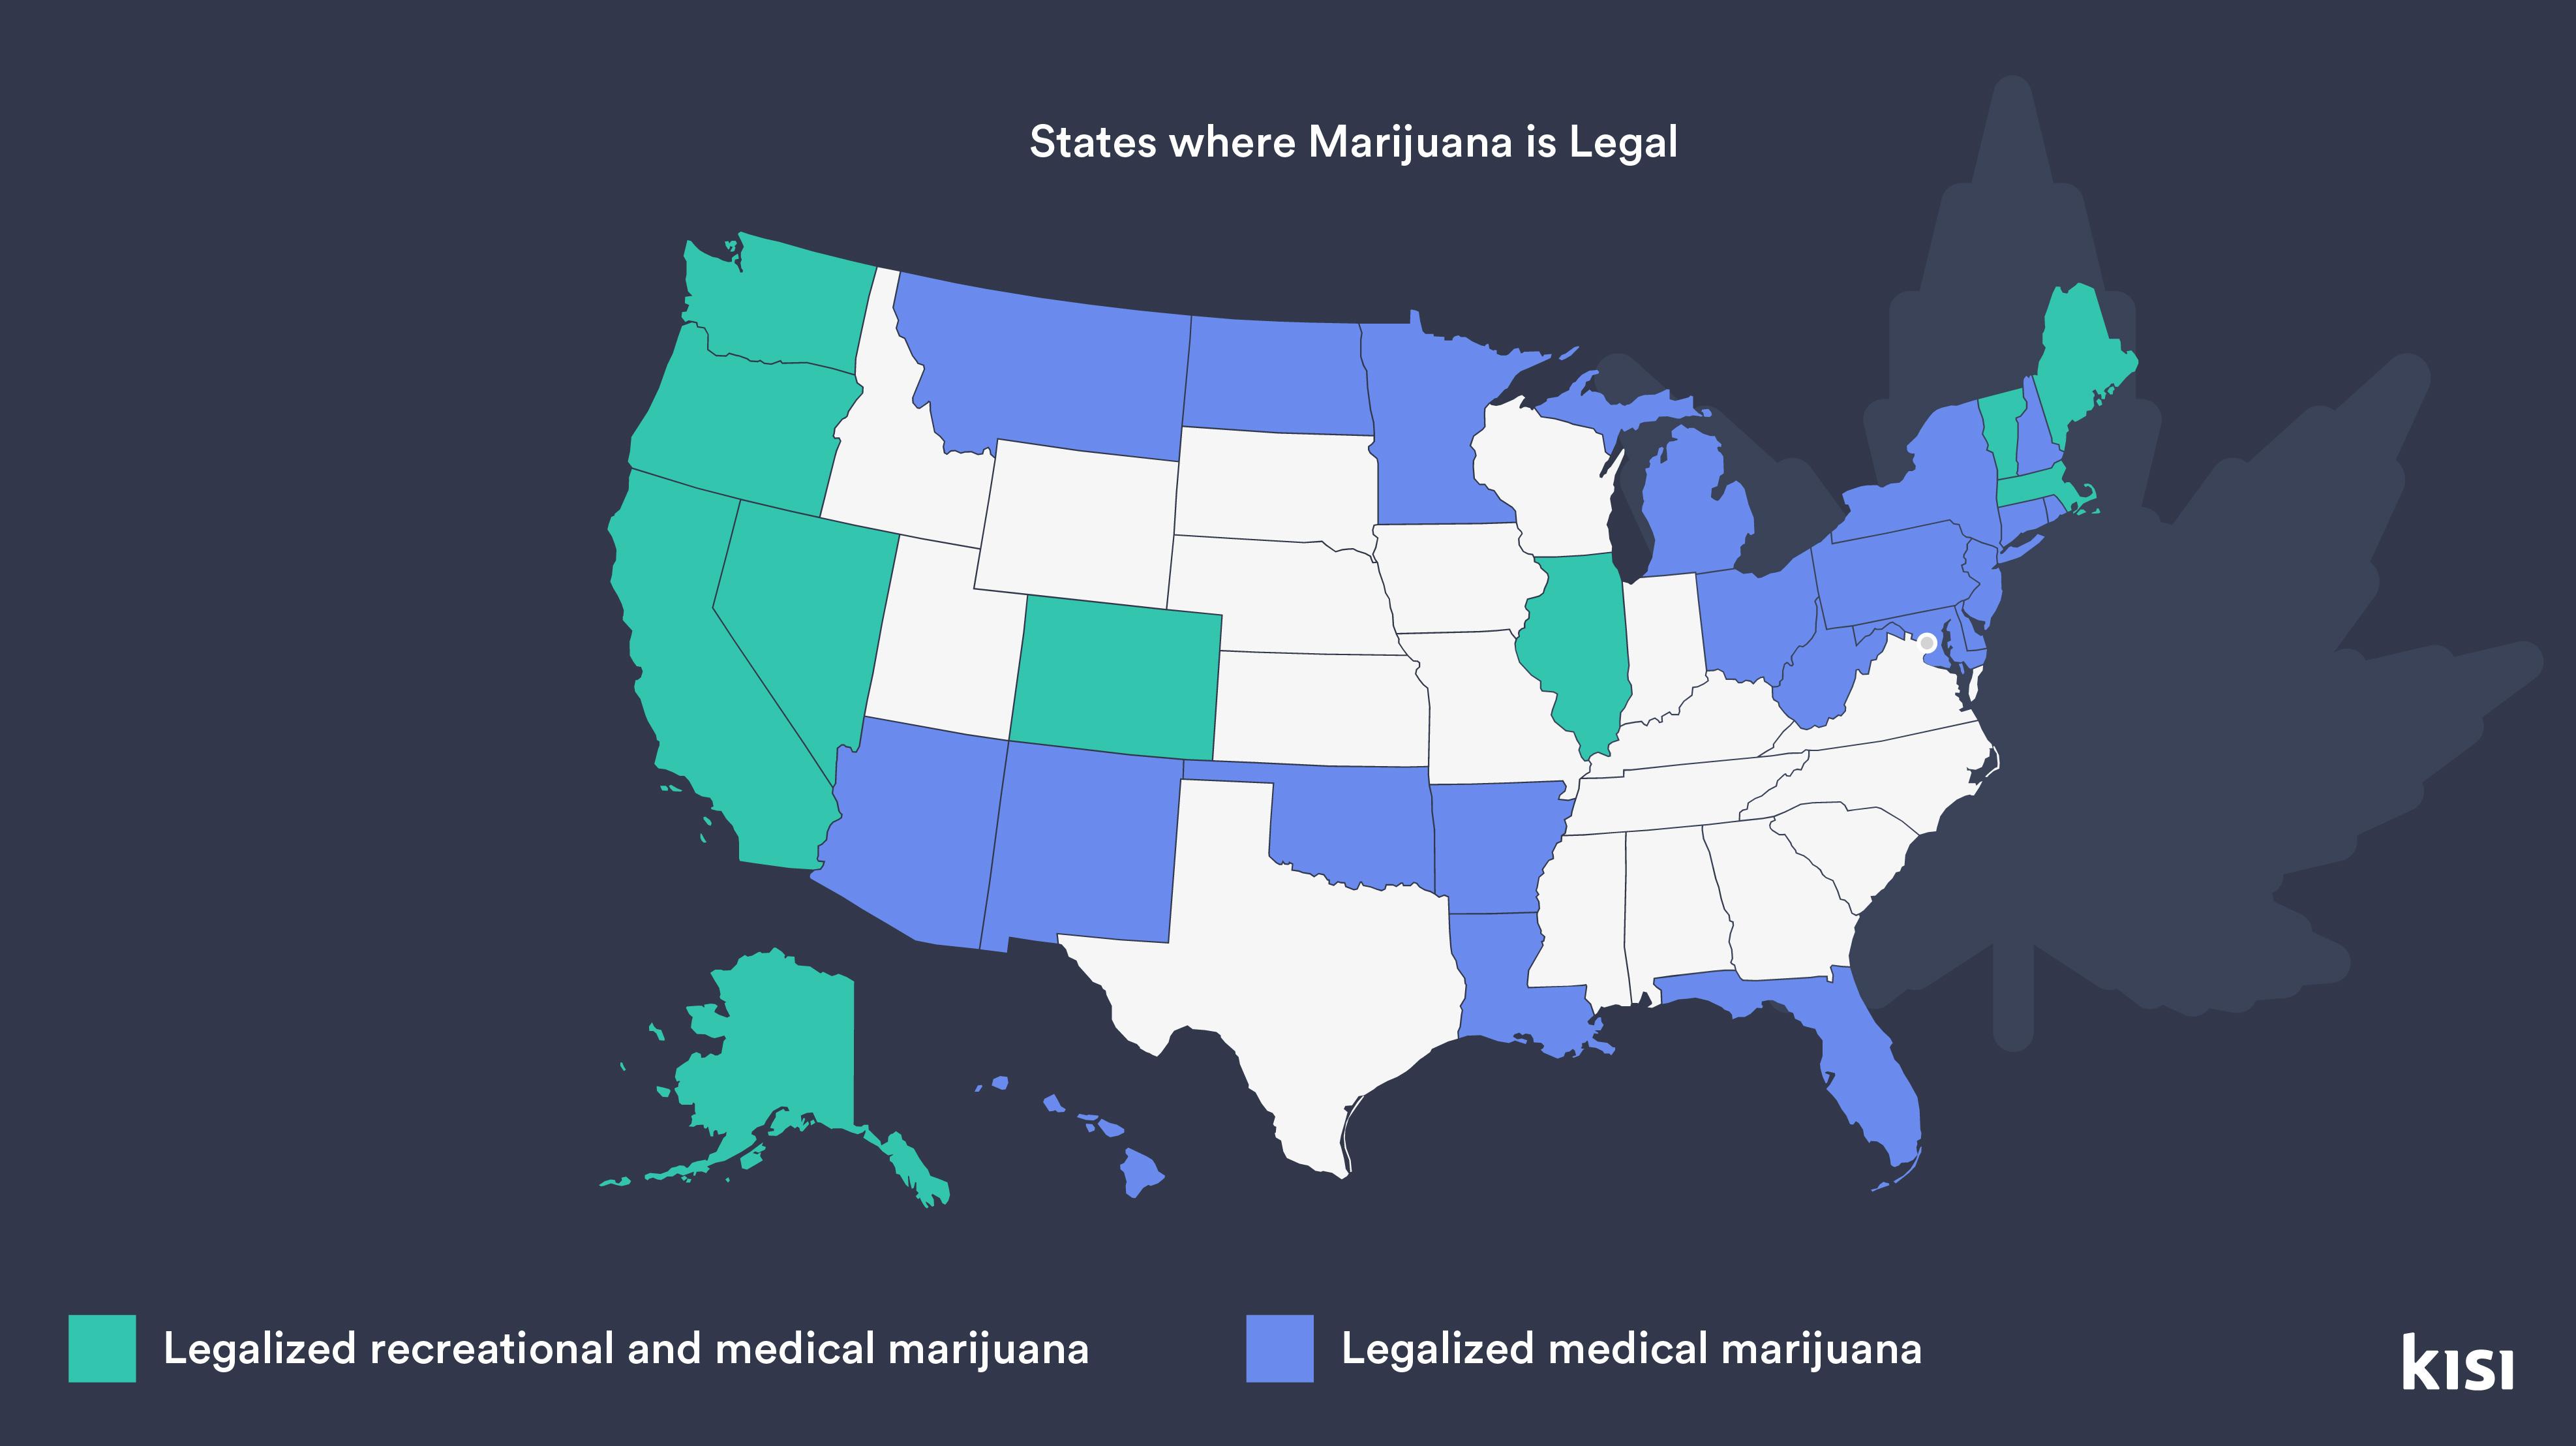 states where marijuana is legal